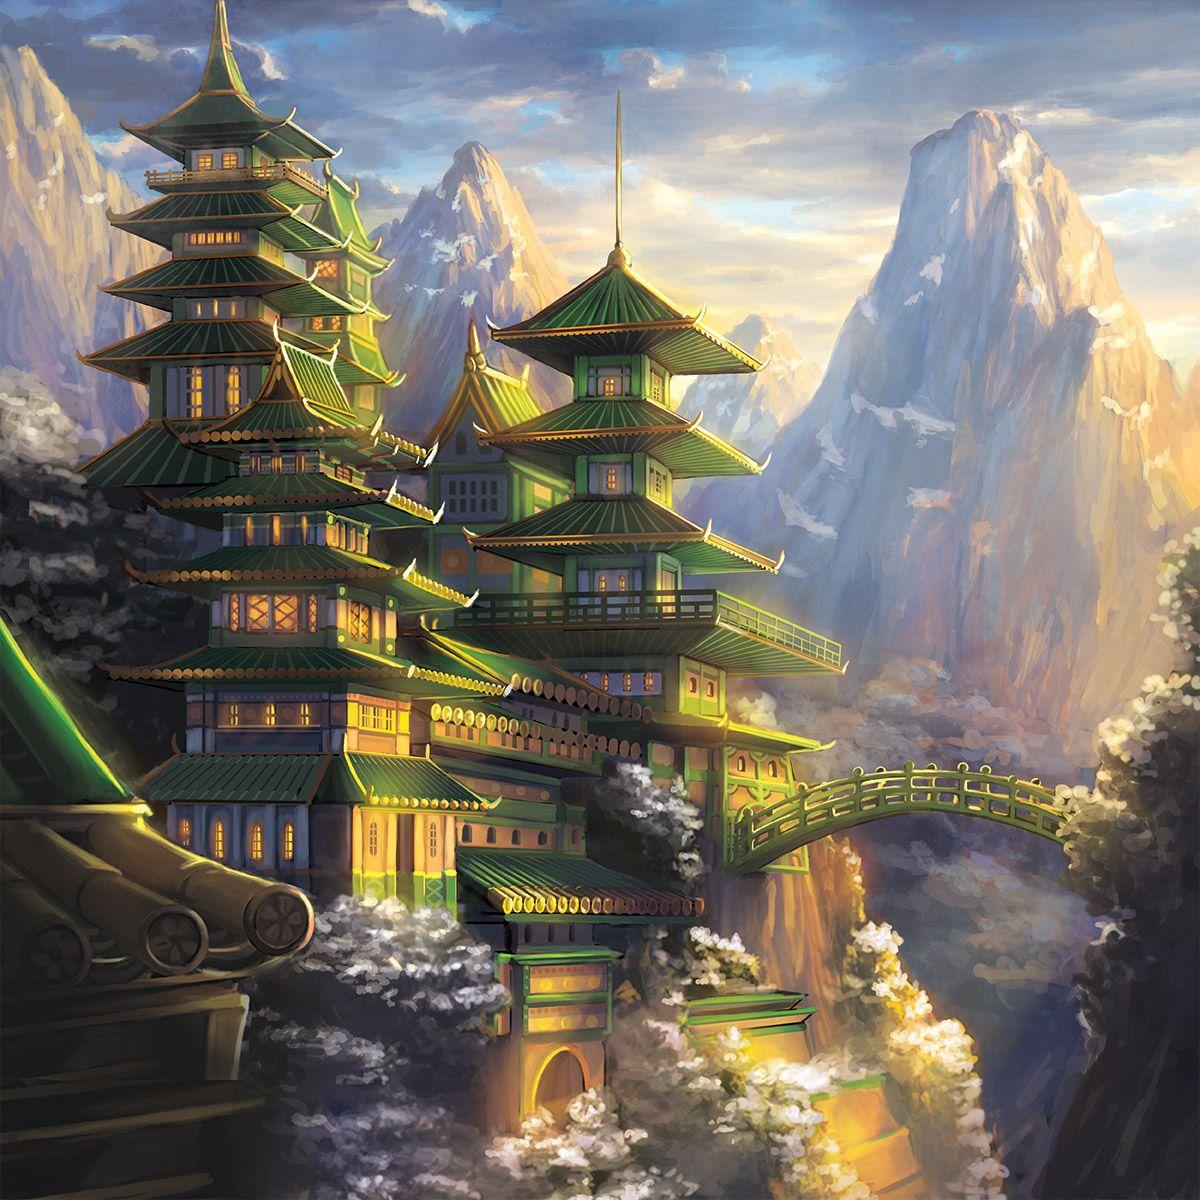 Http://www.deviantart.com/art/Fortified-Monastery-of-the